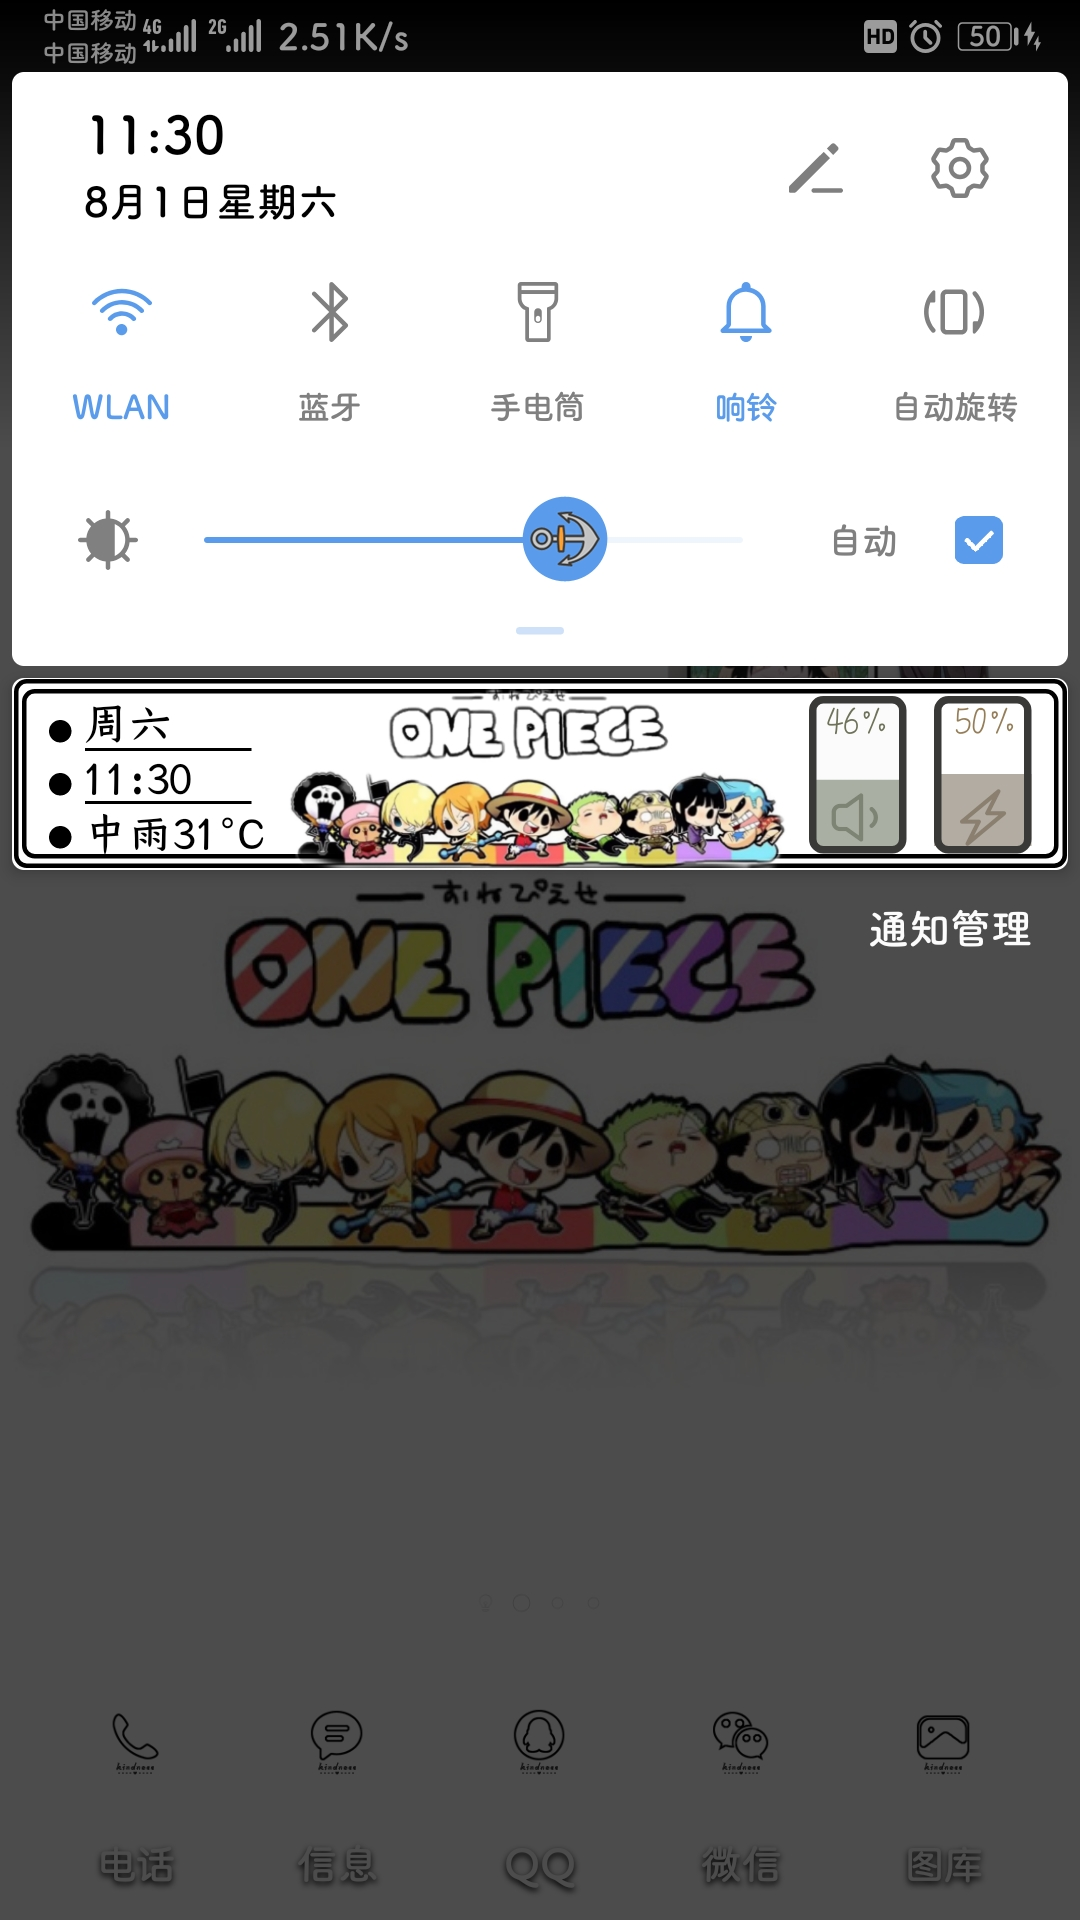 Screenshot_20200801_113057_com.huawei.android.lau.jpg